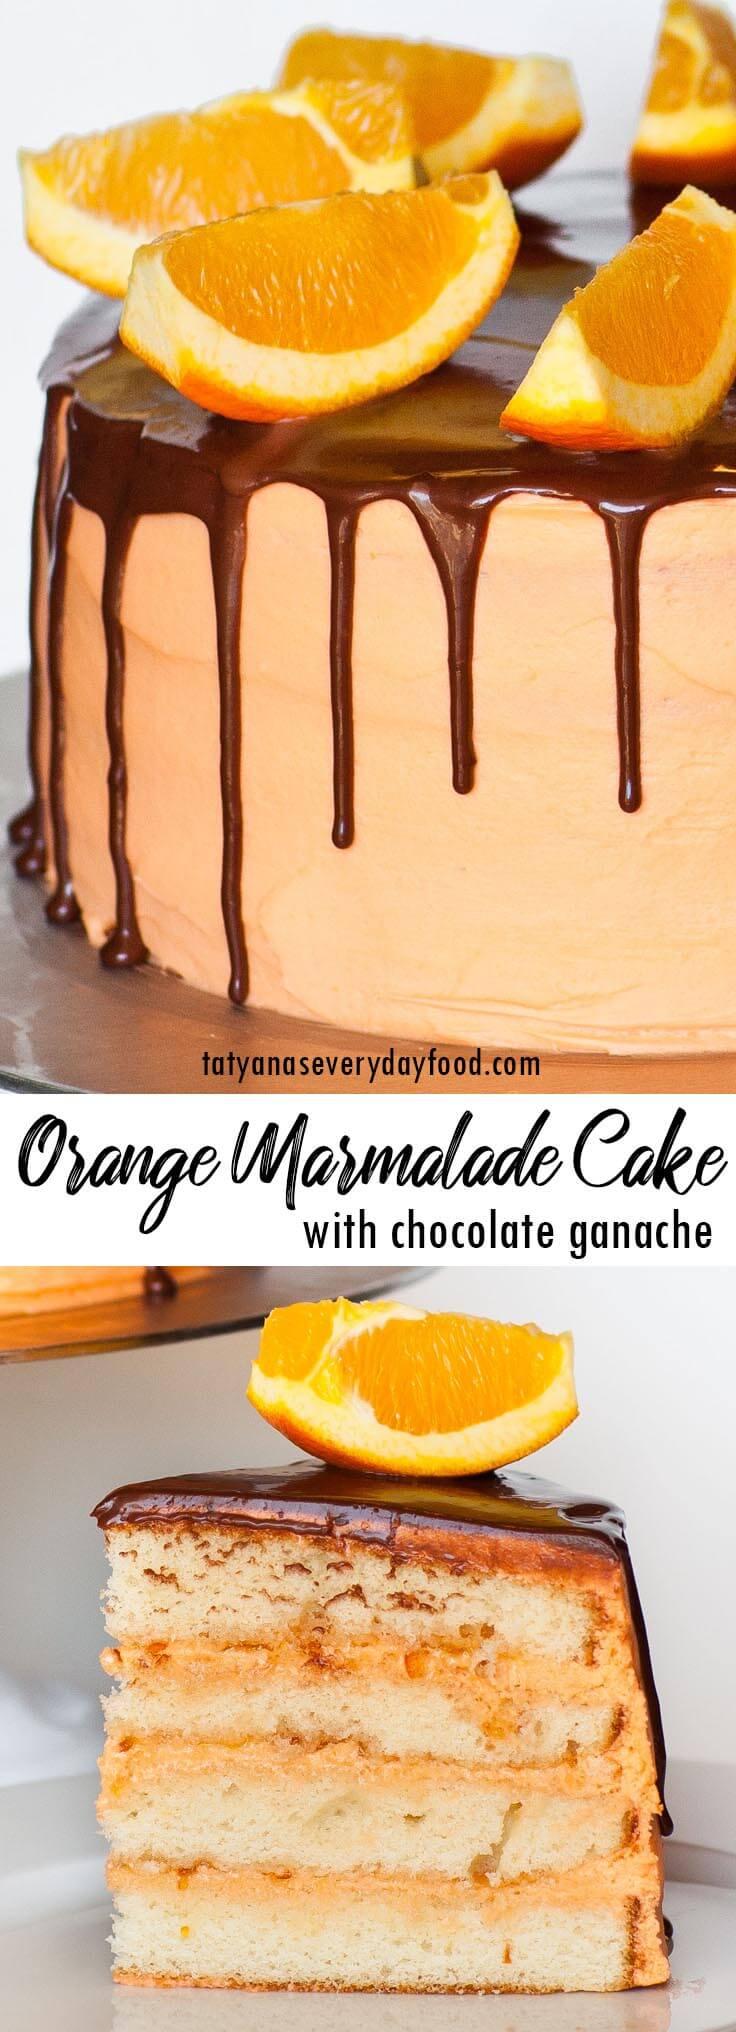 Orange Marmalade Cake video recipe